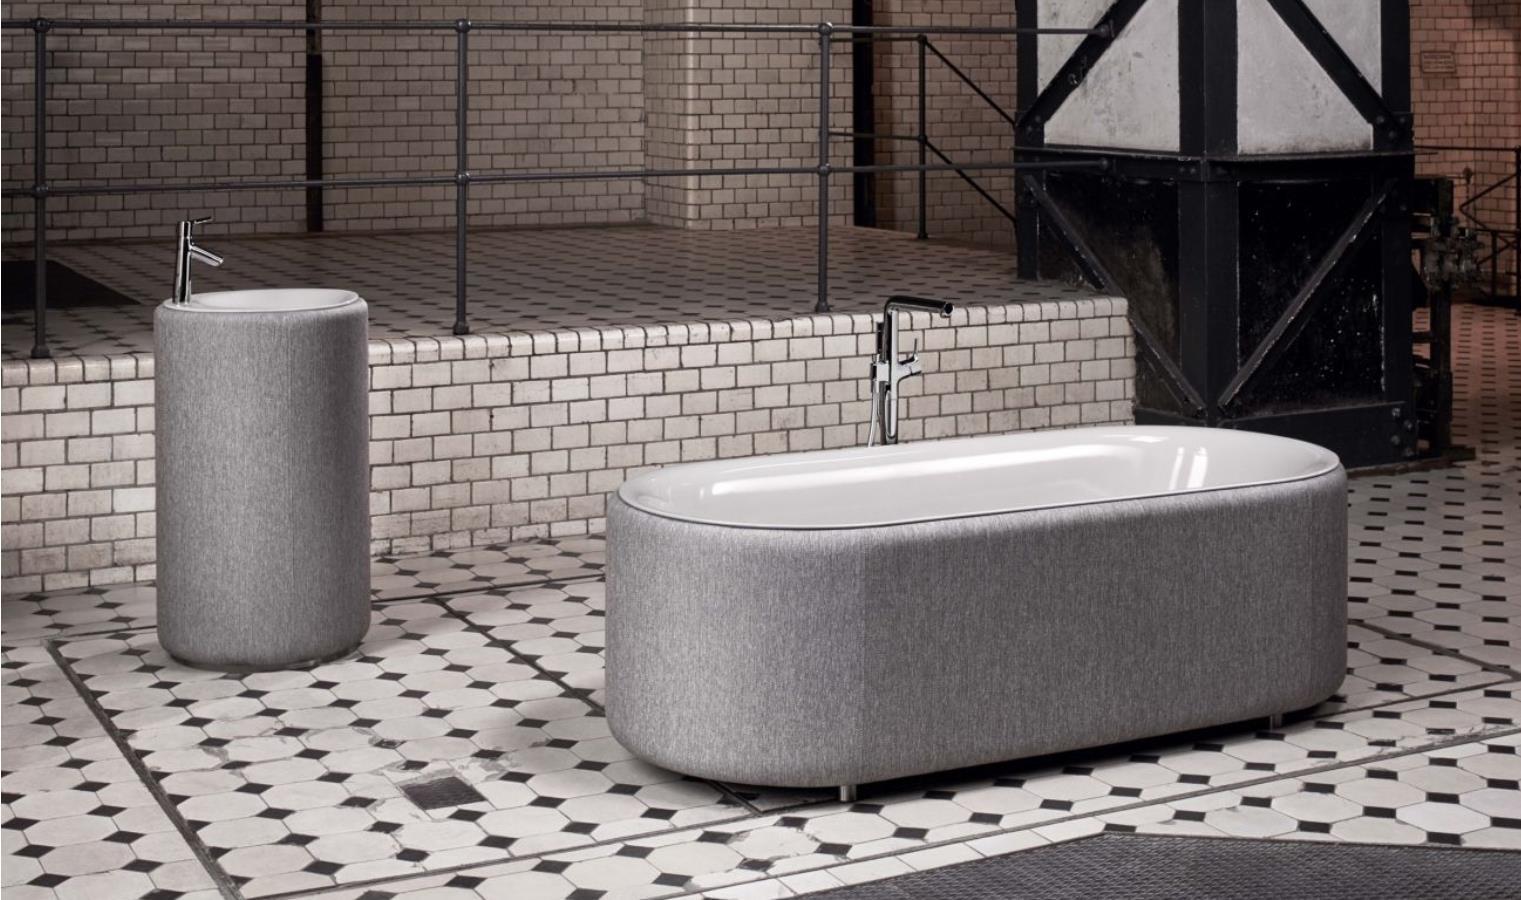 Vasca Da Bagno Bette : Sanitari arredo bagno alto adige bettelux oval couture vasca